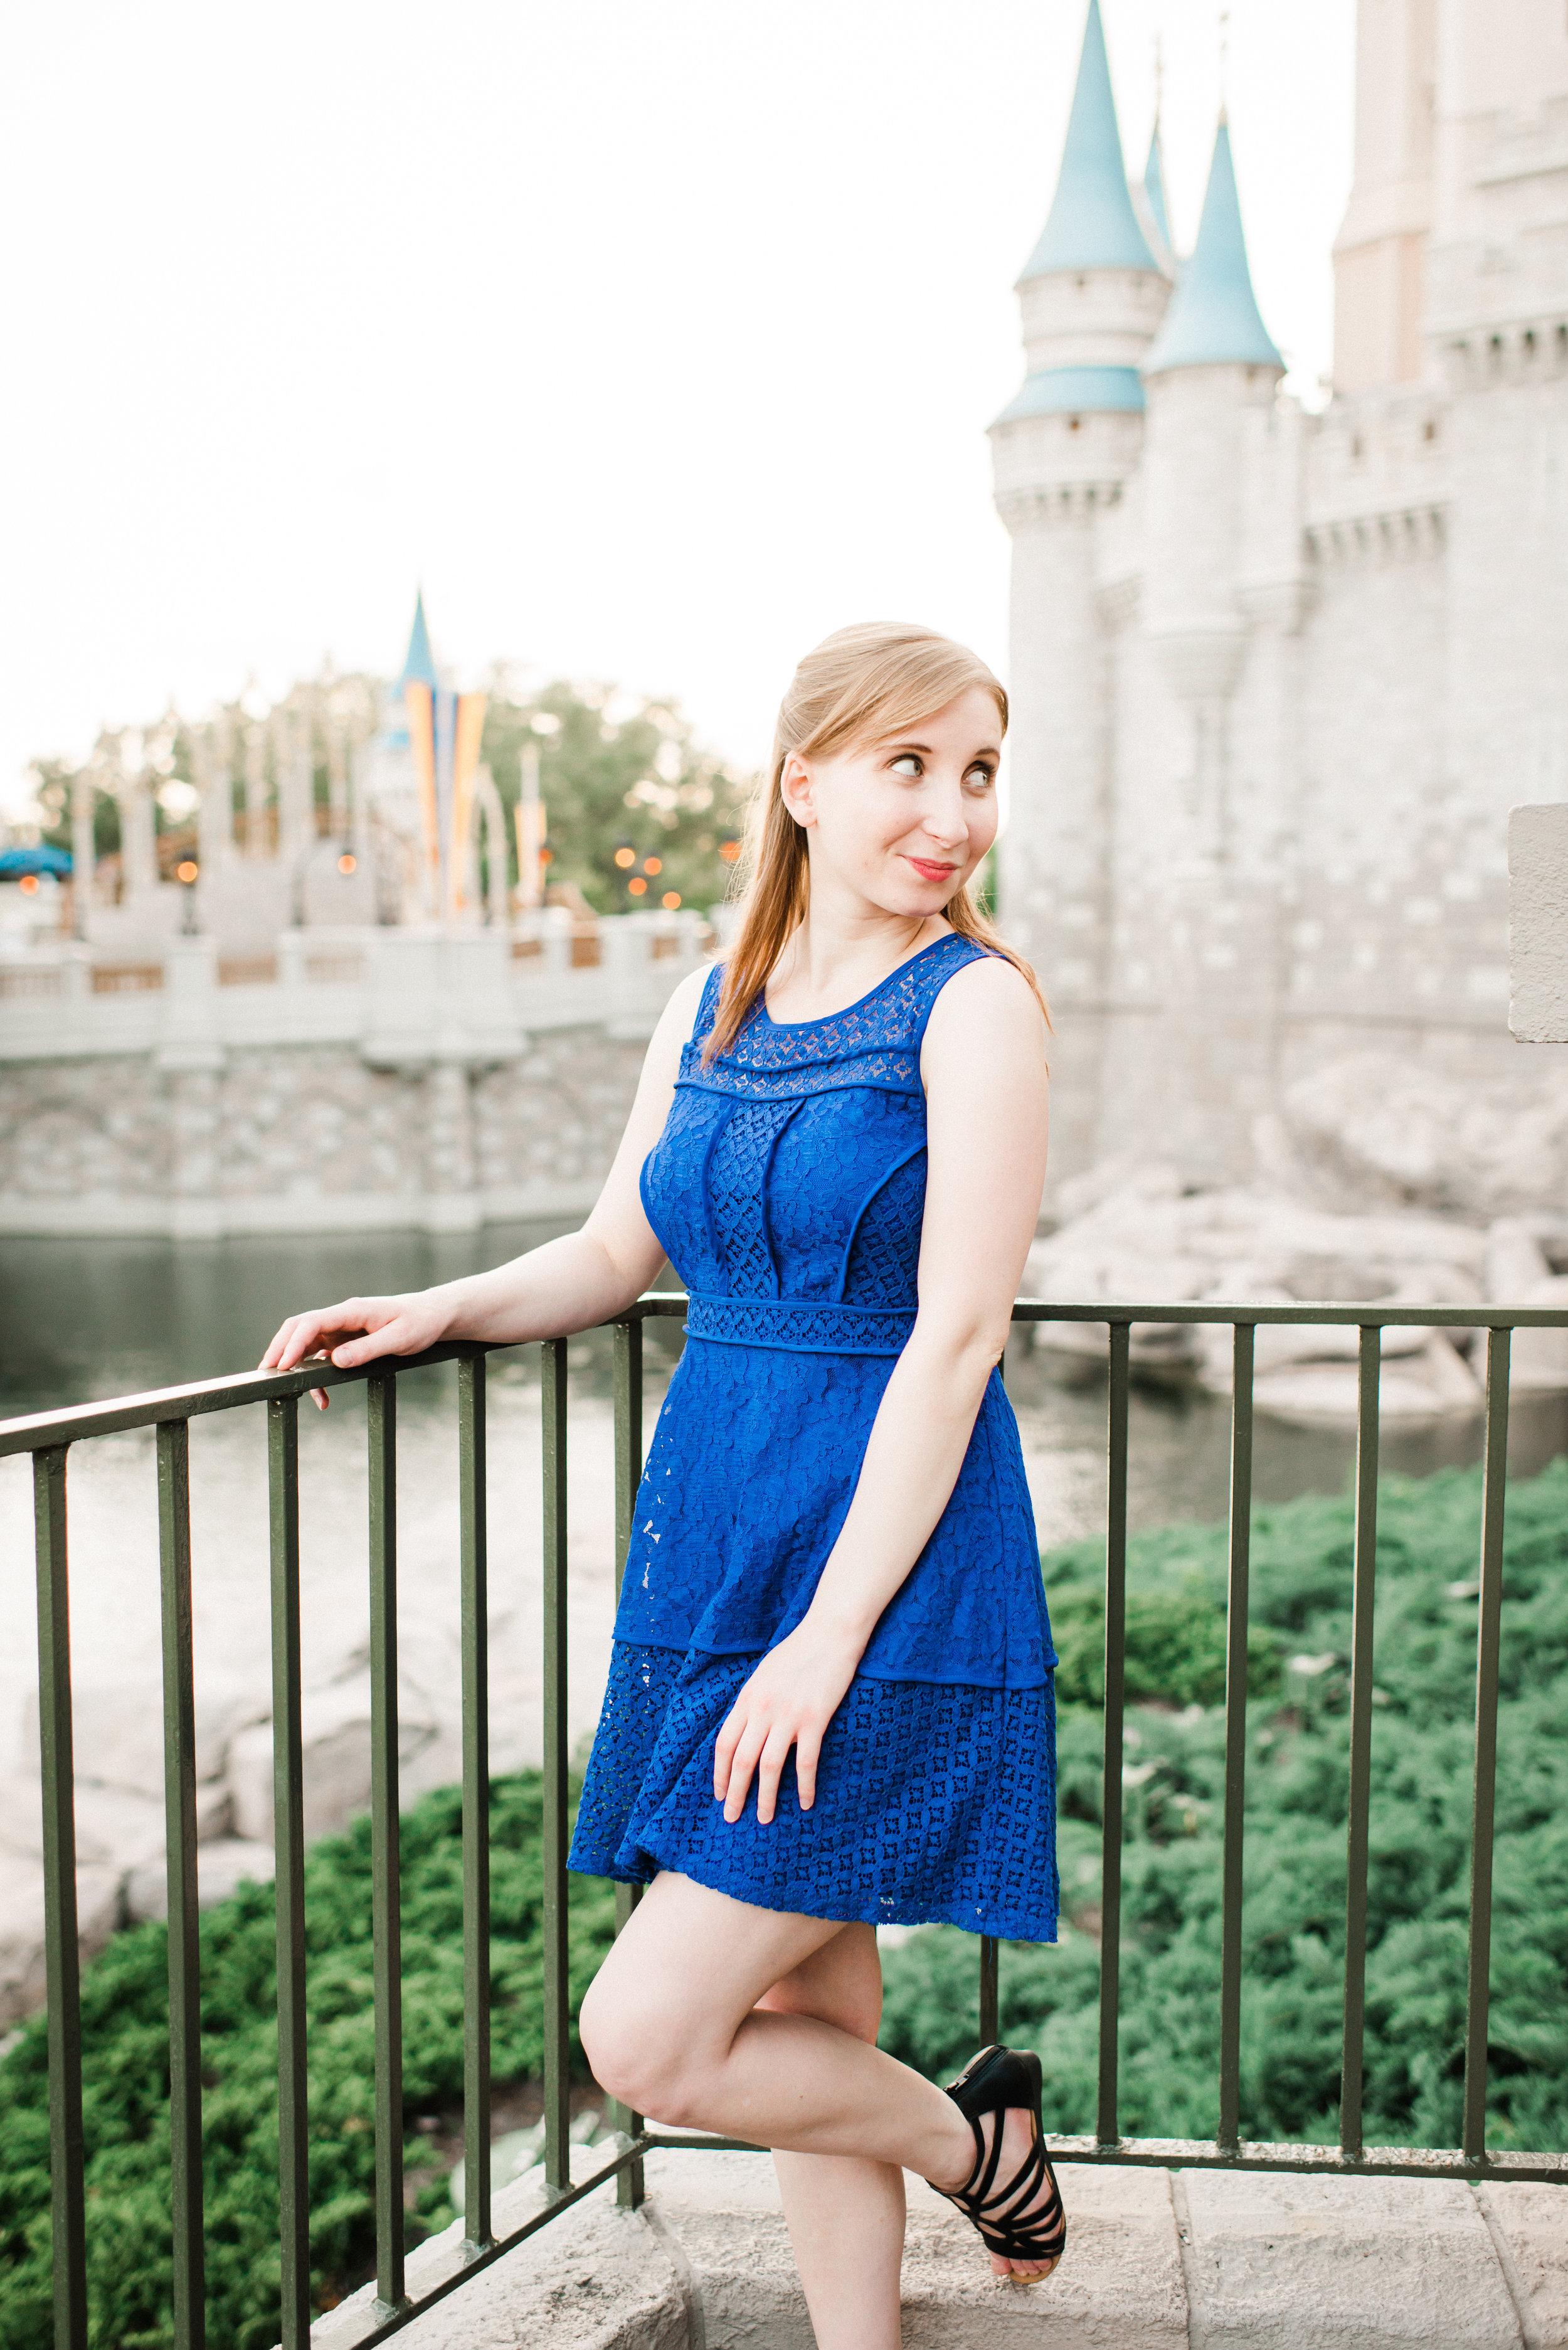 KateTaramykinStudios-Disney-World-Magic-Kingdom-Portraits-Jess-17.jpg